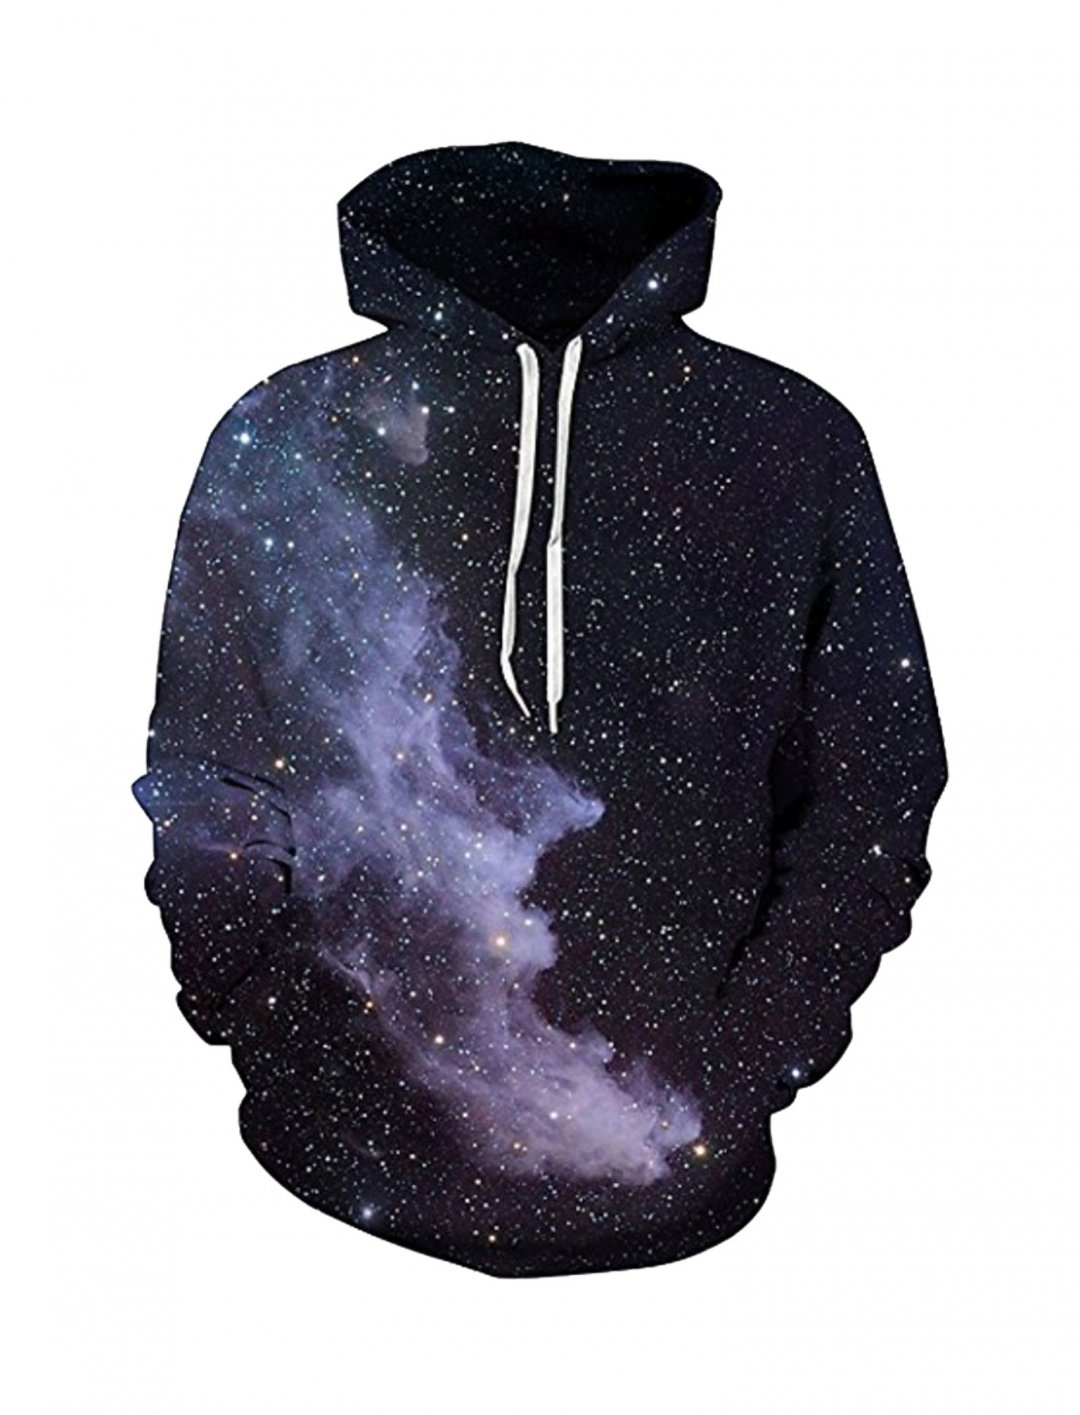 Galaxy Hoodie Clothing sankill